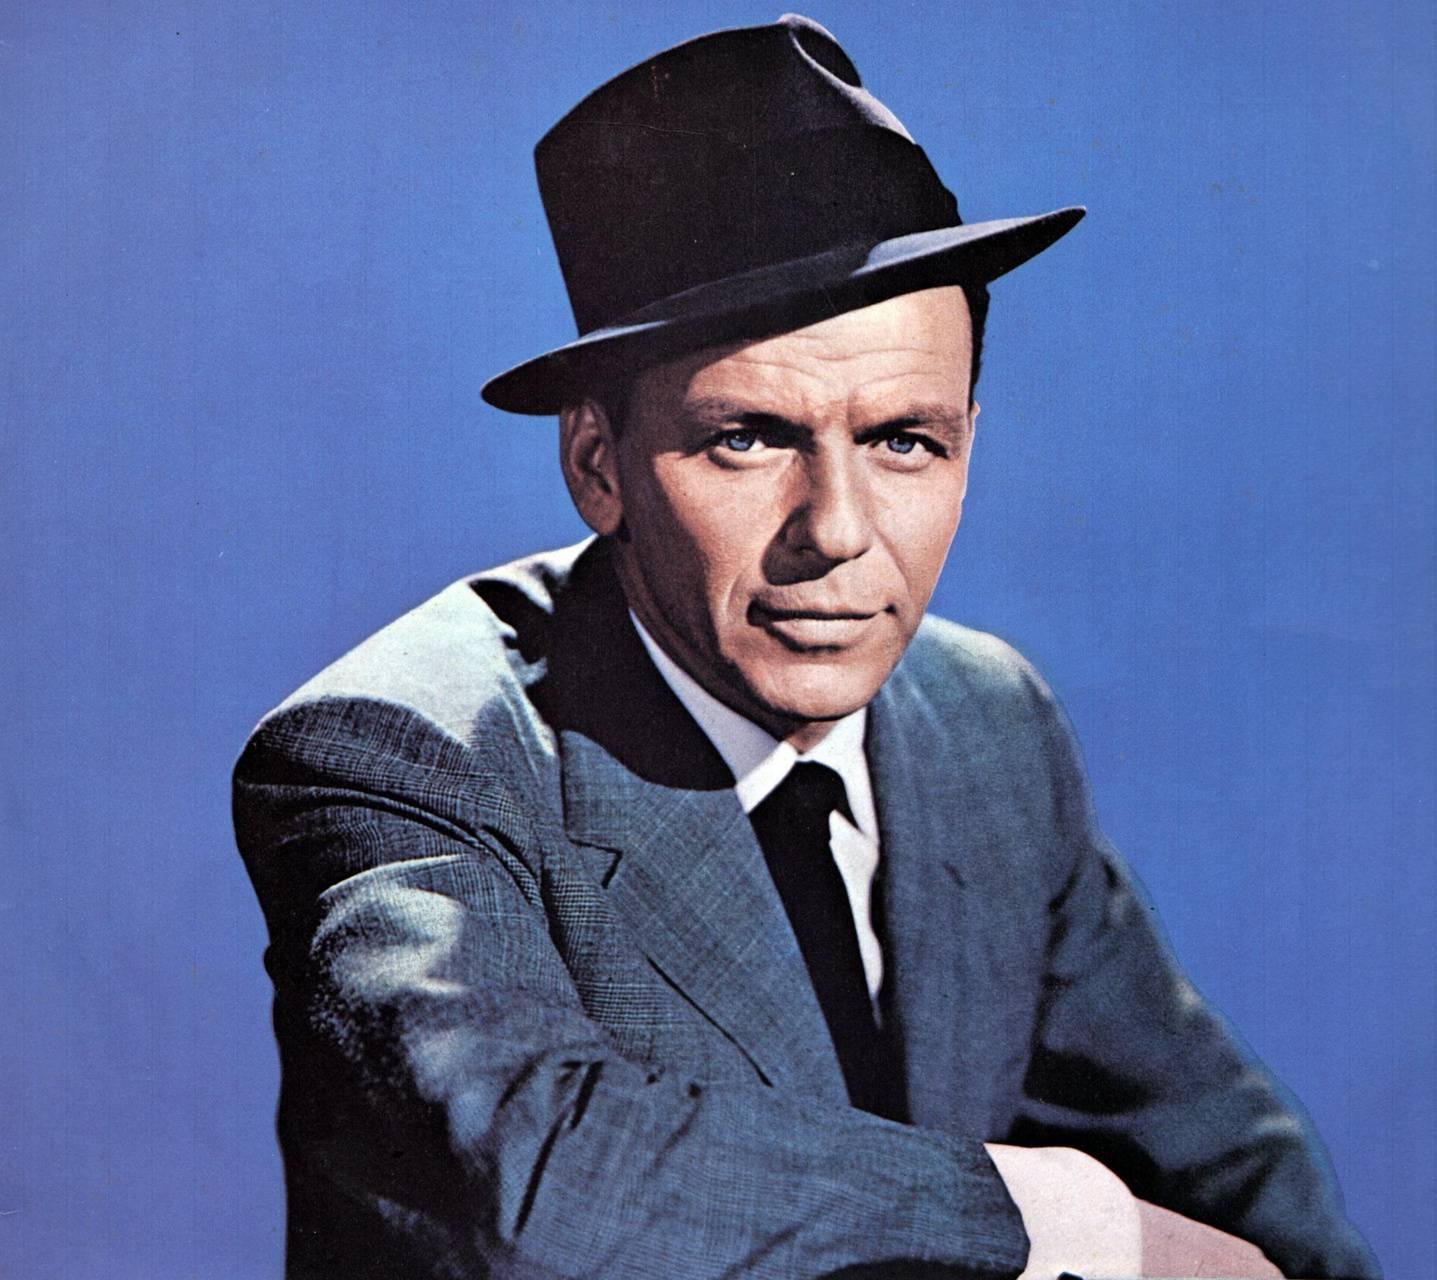 Frank Sinatra wallpaper by Tdd_p - 15 - Free on ZEDGE™